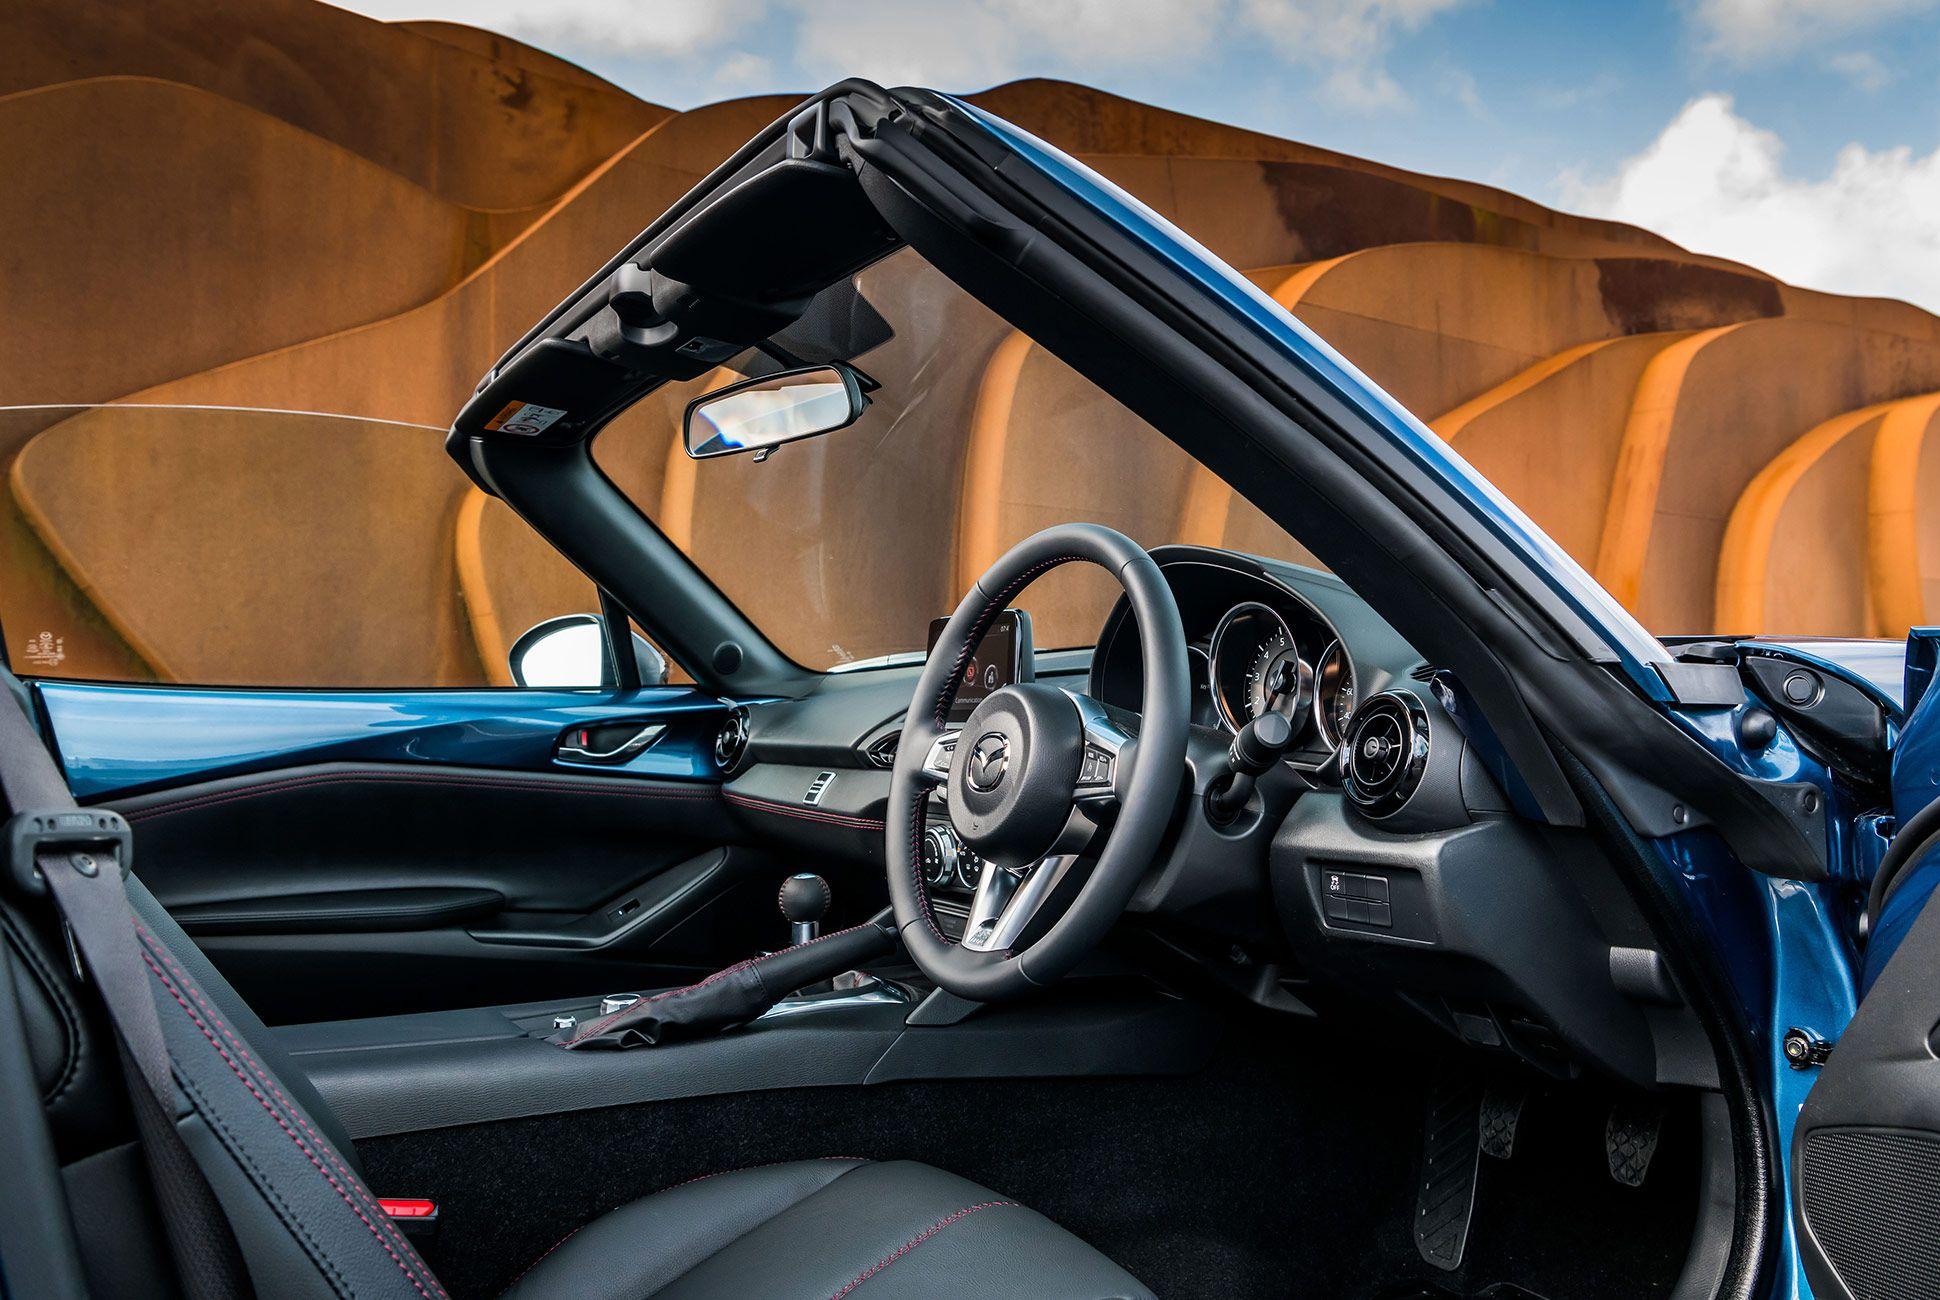 Mazda-Miata-MX5-RF-Sport-Black-gear-patrol-slide-6